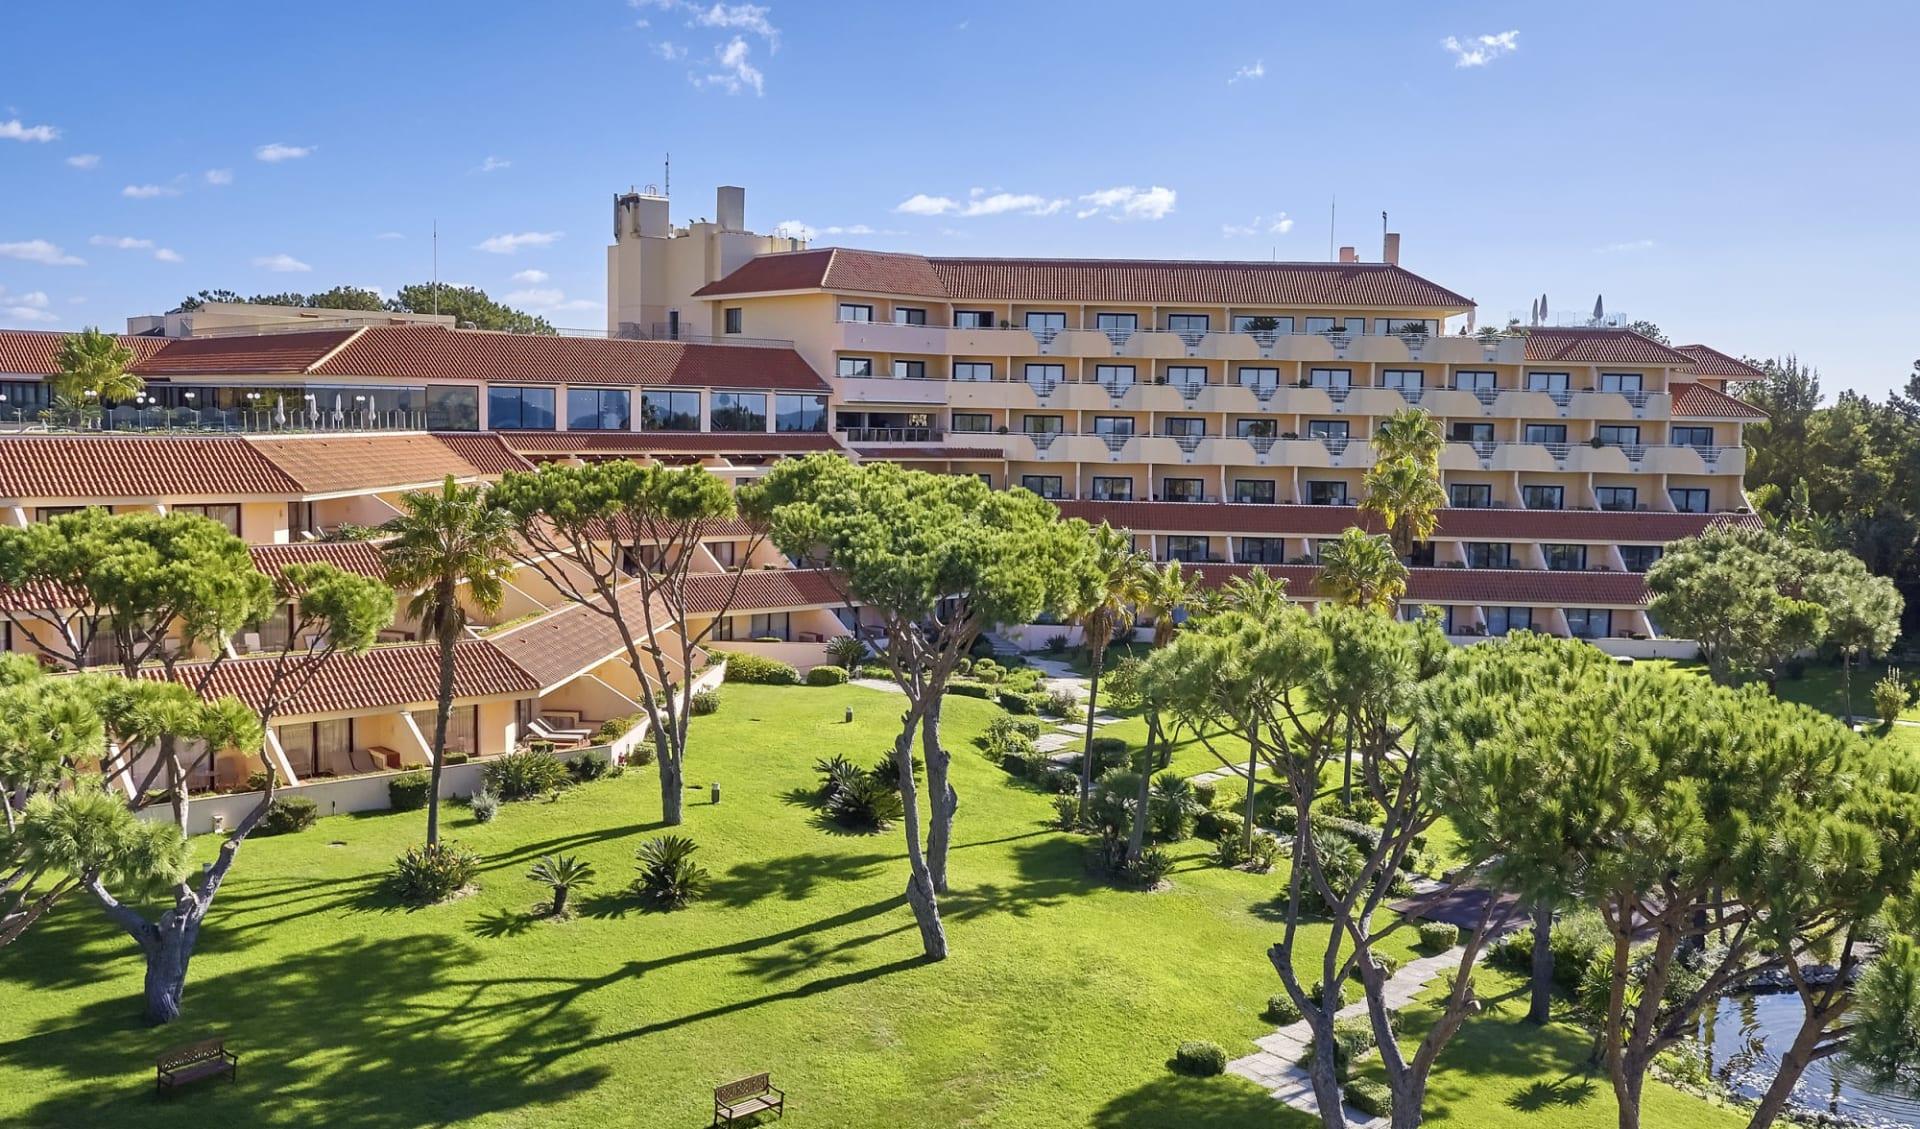 Quinta do Lago in Almancil: Quinta do Lago - Garten und Hotel